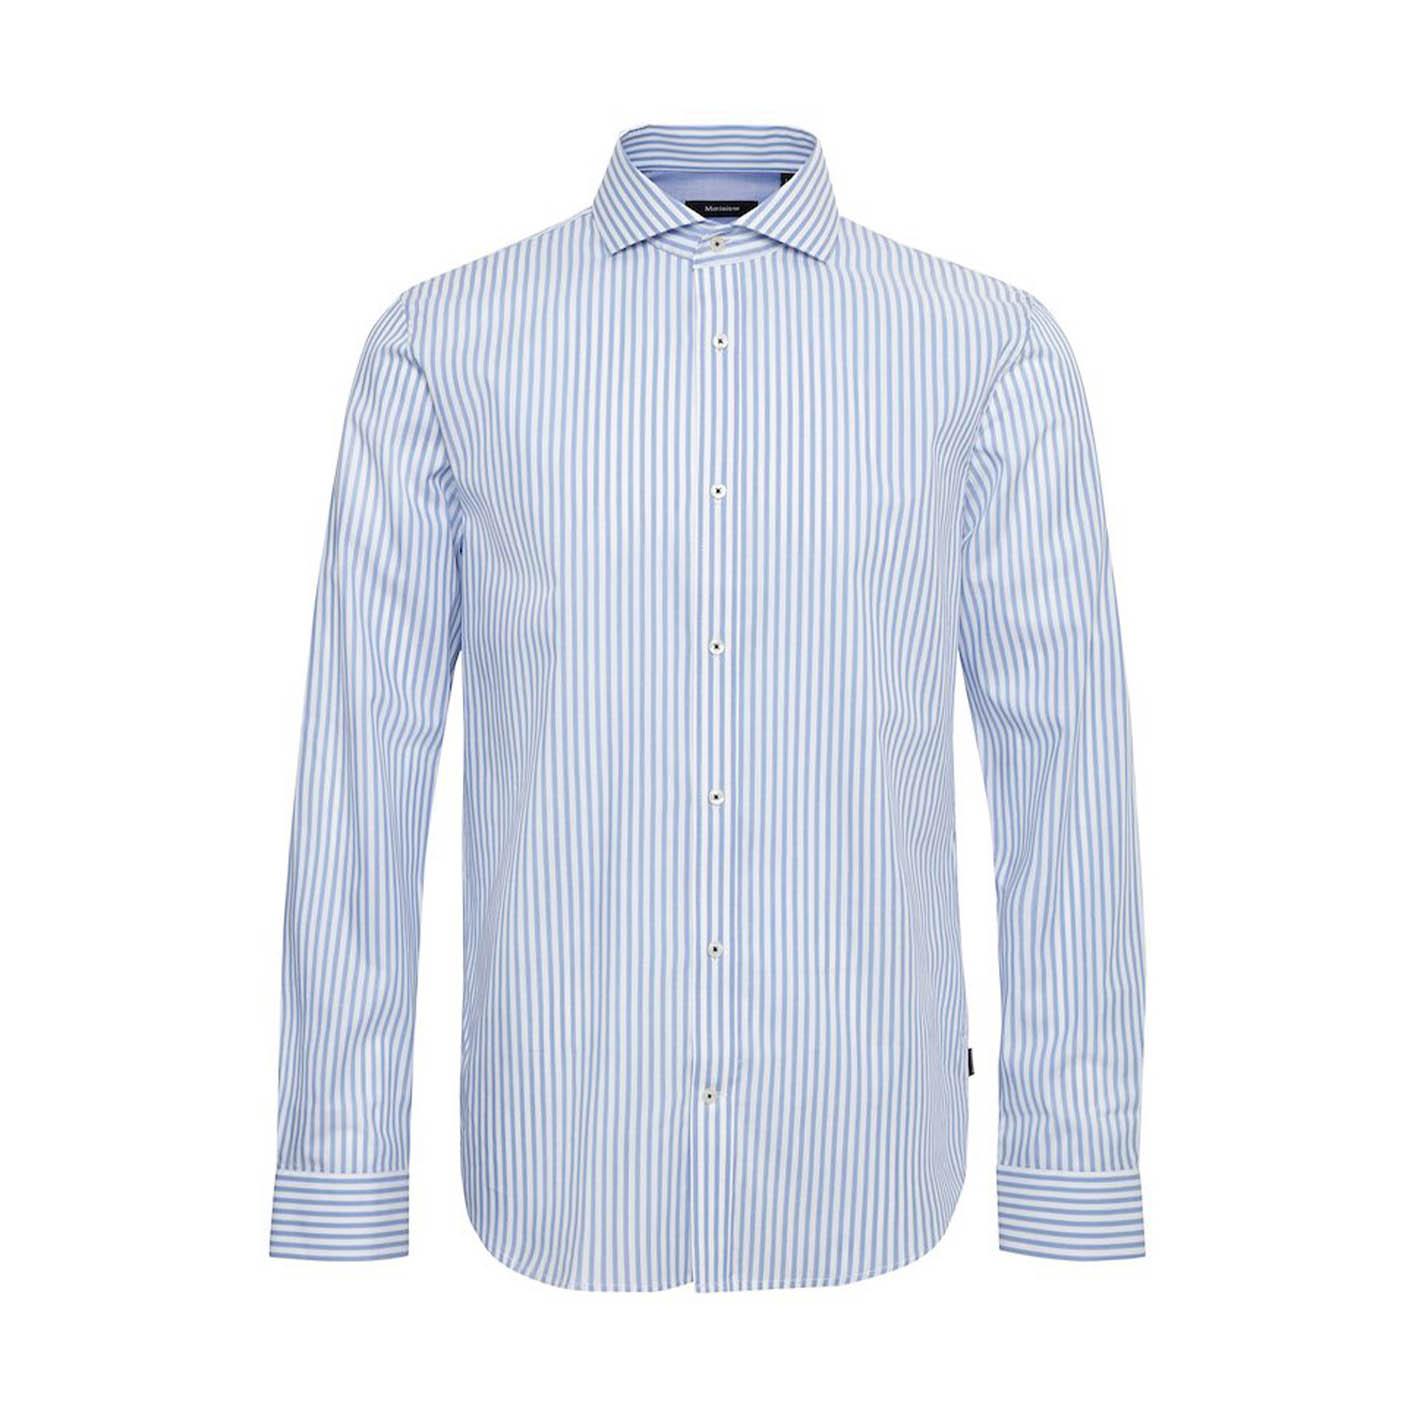 Matinique MAtrostol BC1 Blue Stripe Shirts